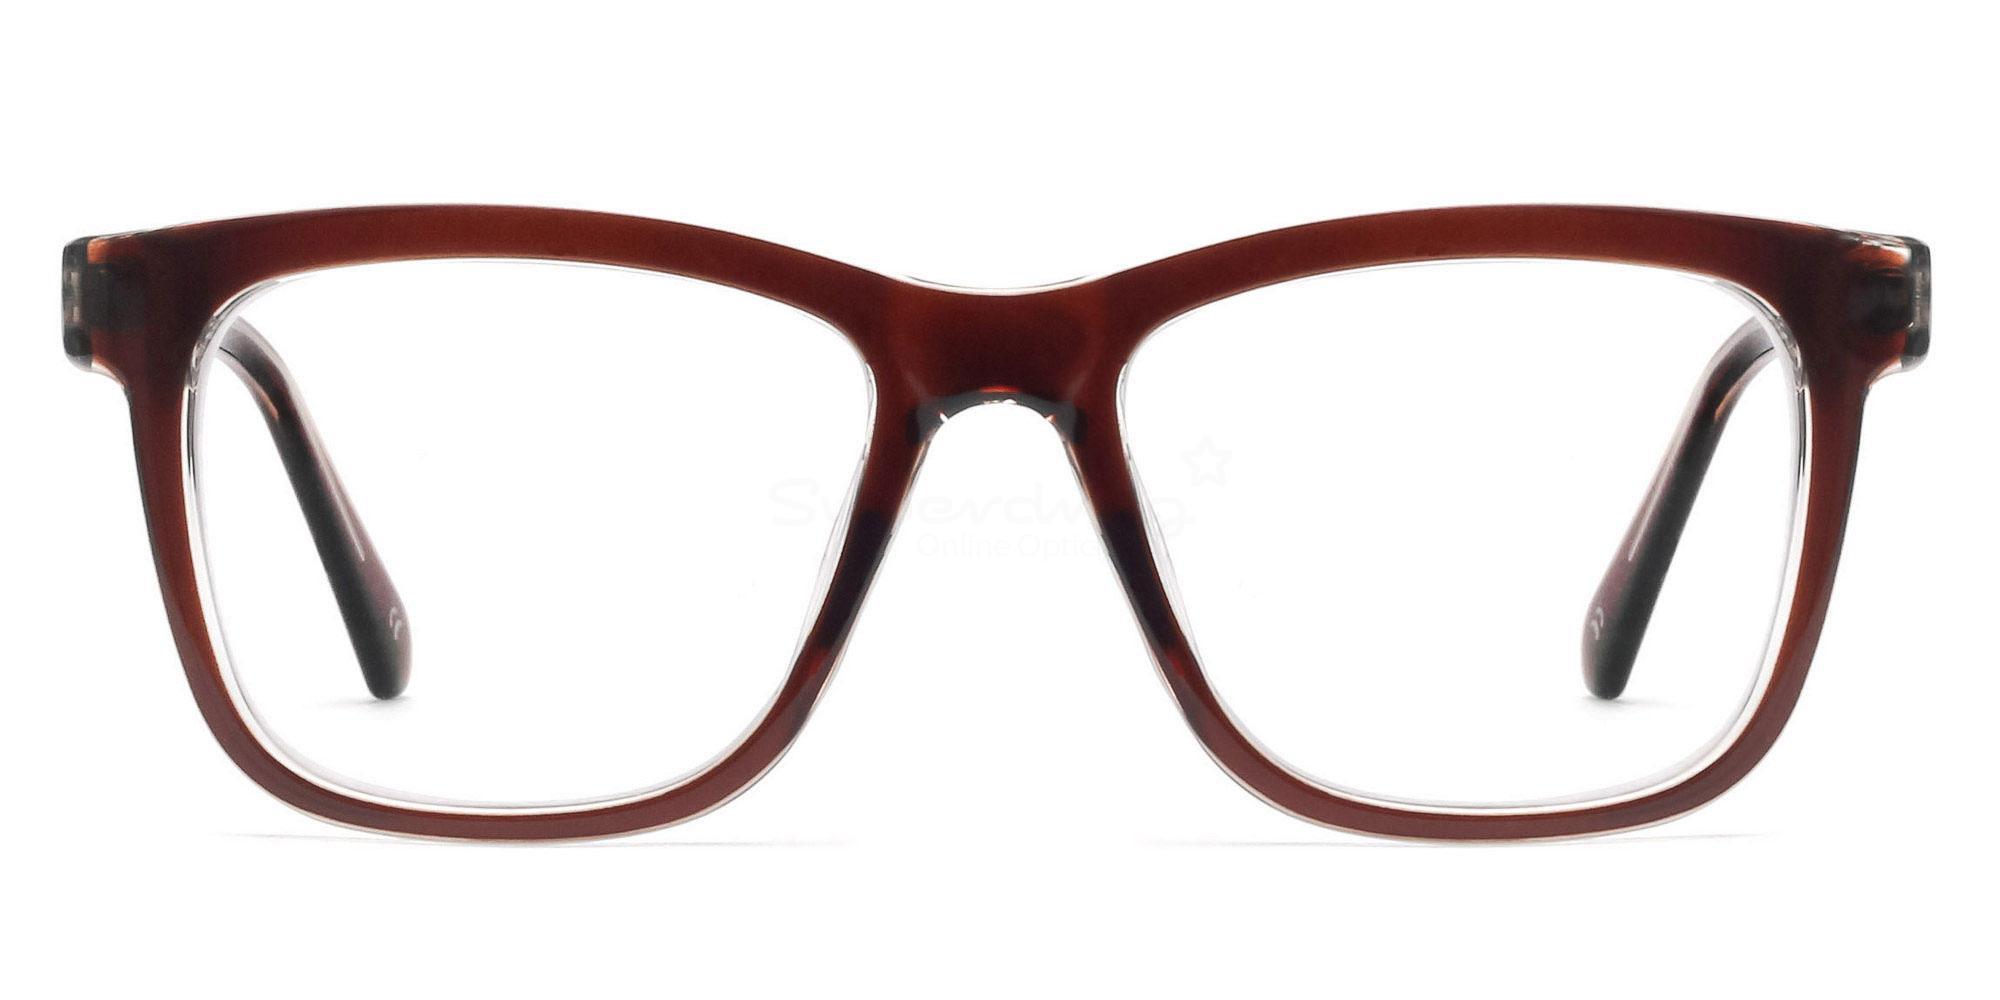 C37 2444 - Brown Glasses, Helium